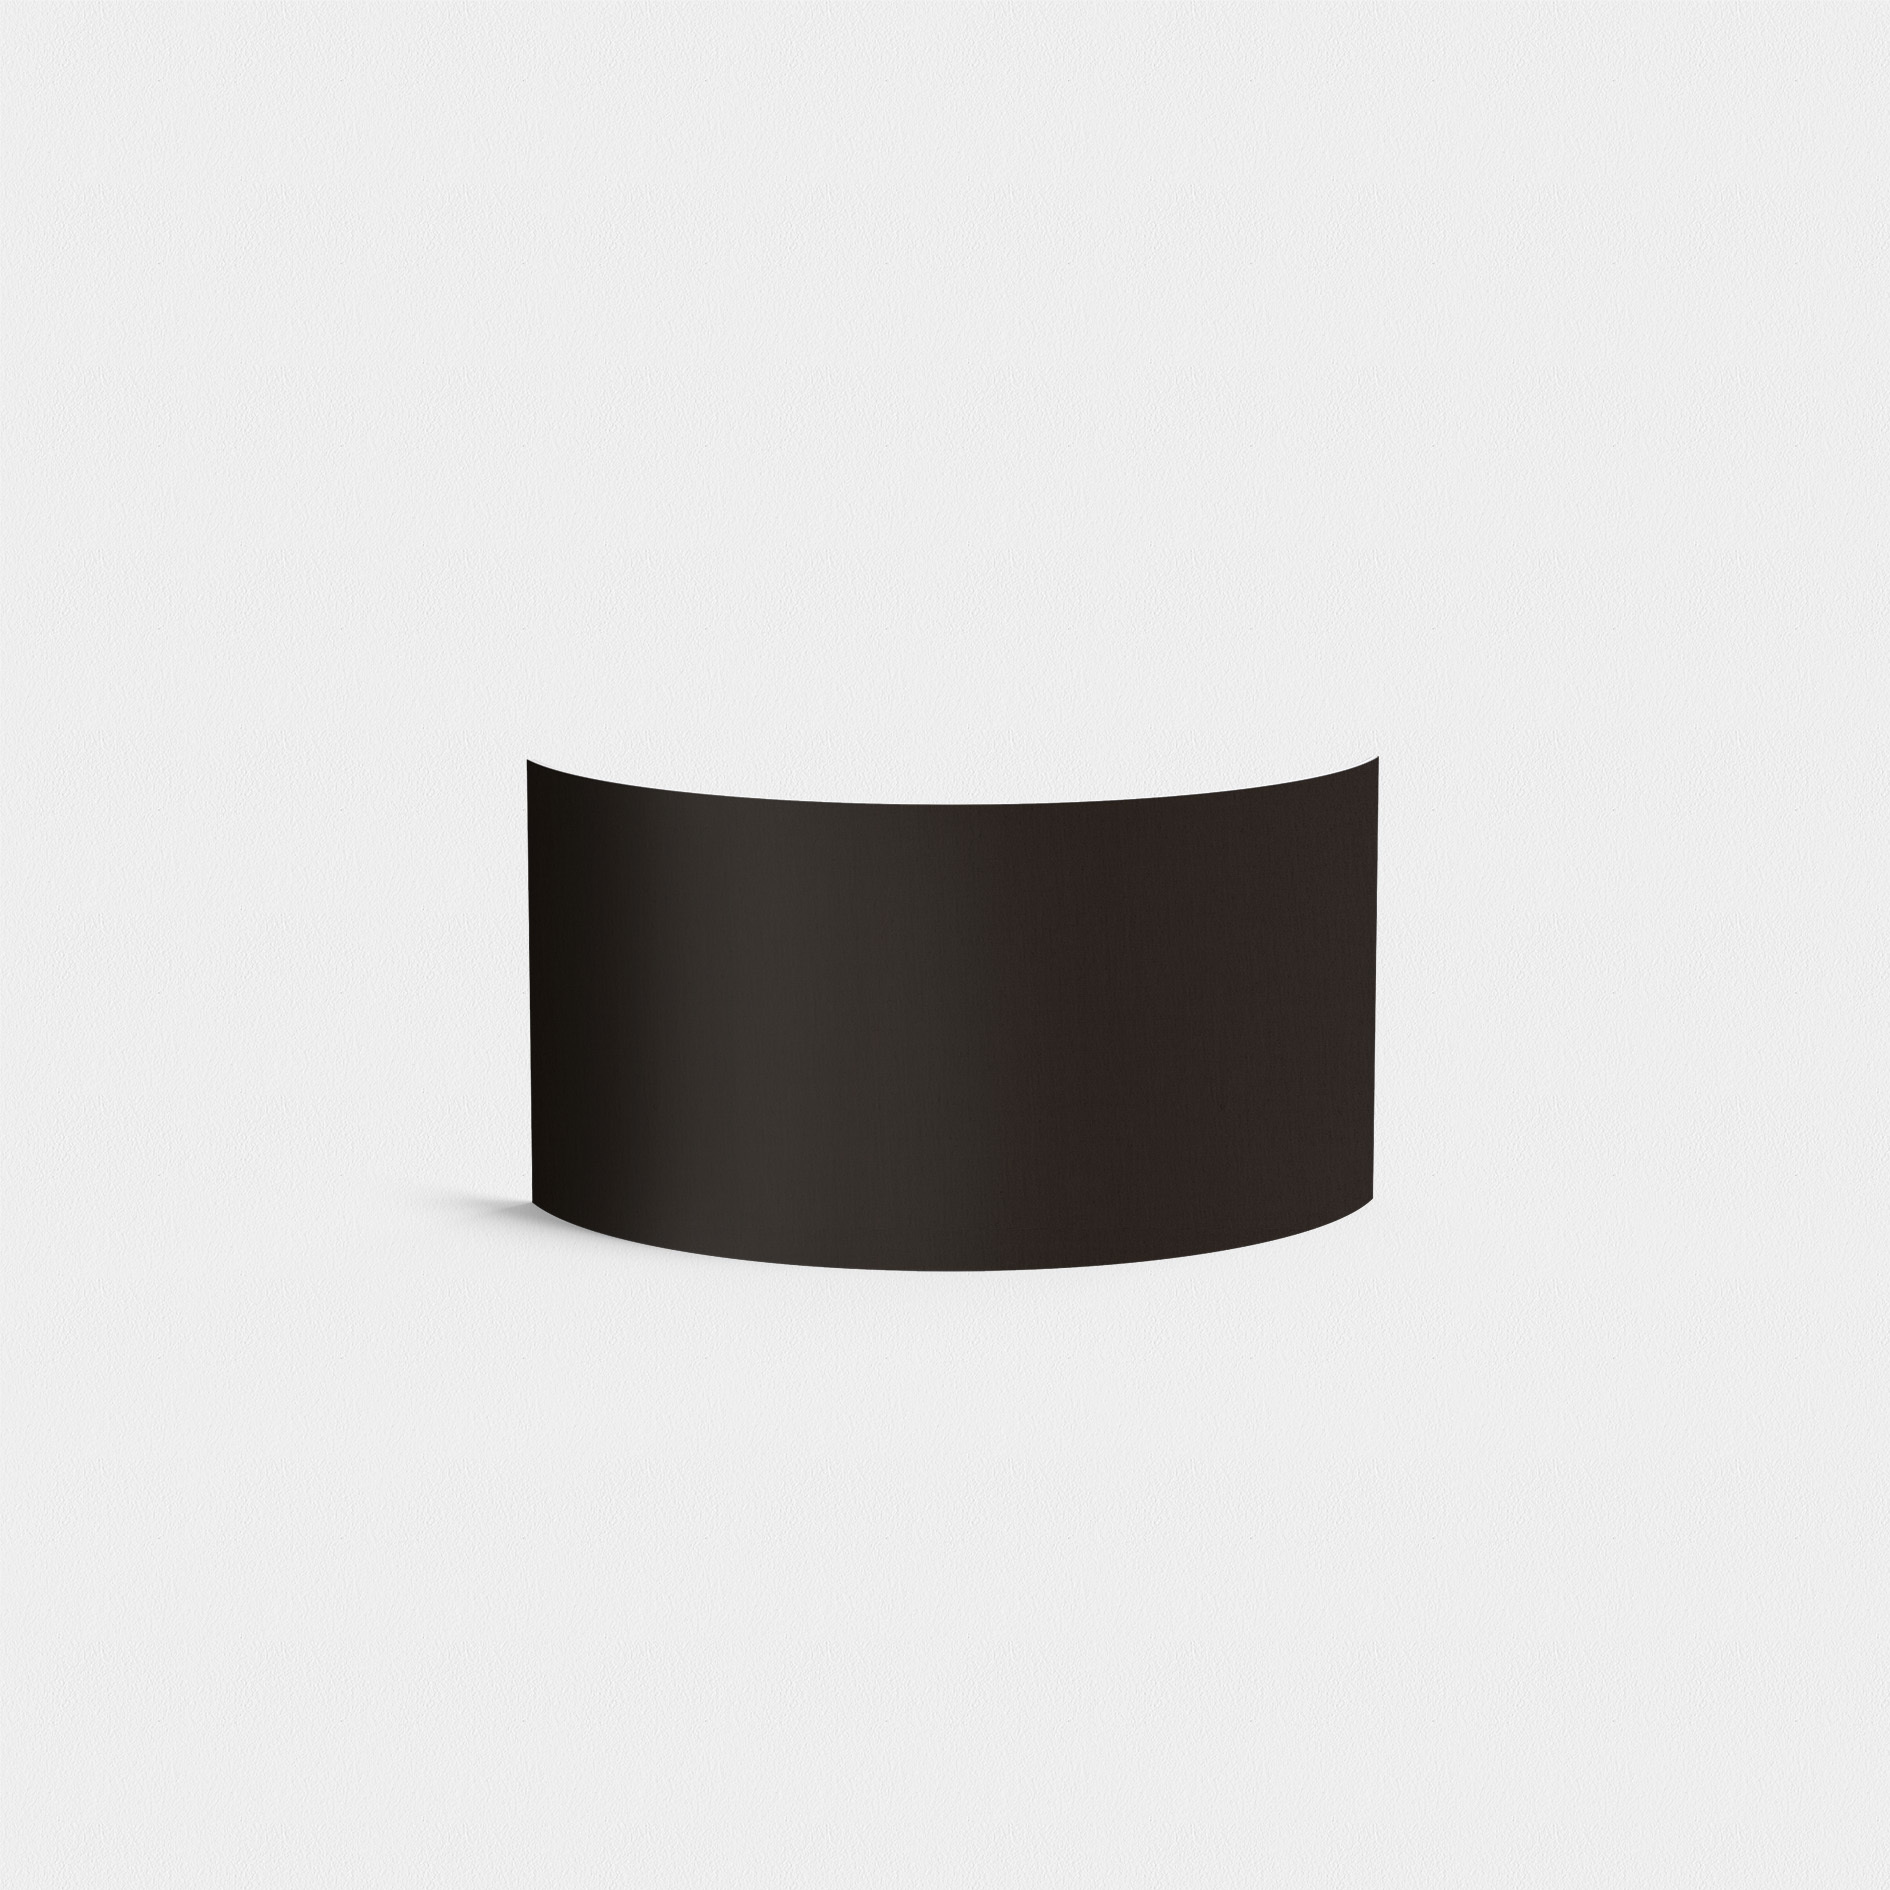 Абажур Astro Semi Drum 5026002 (4136), черный, текстиль - фото 1